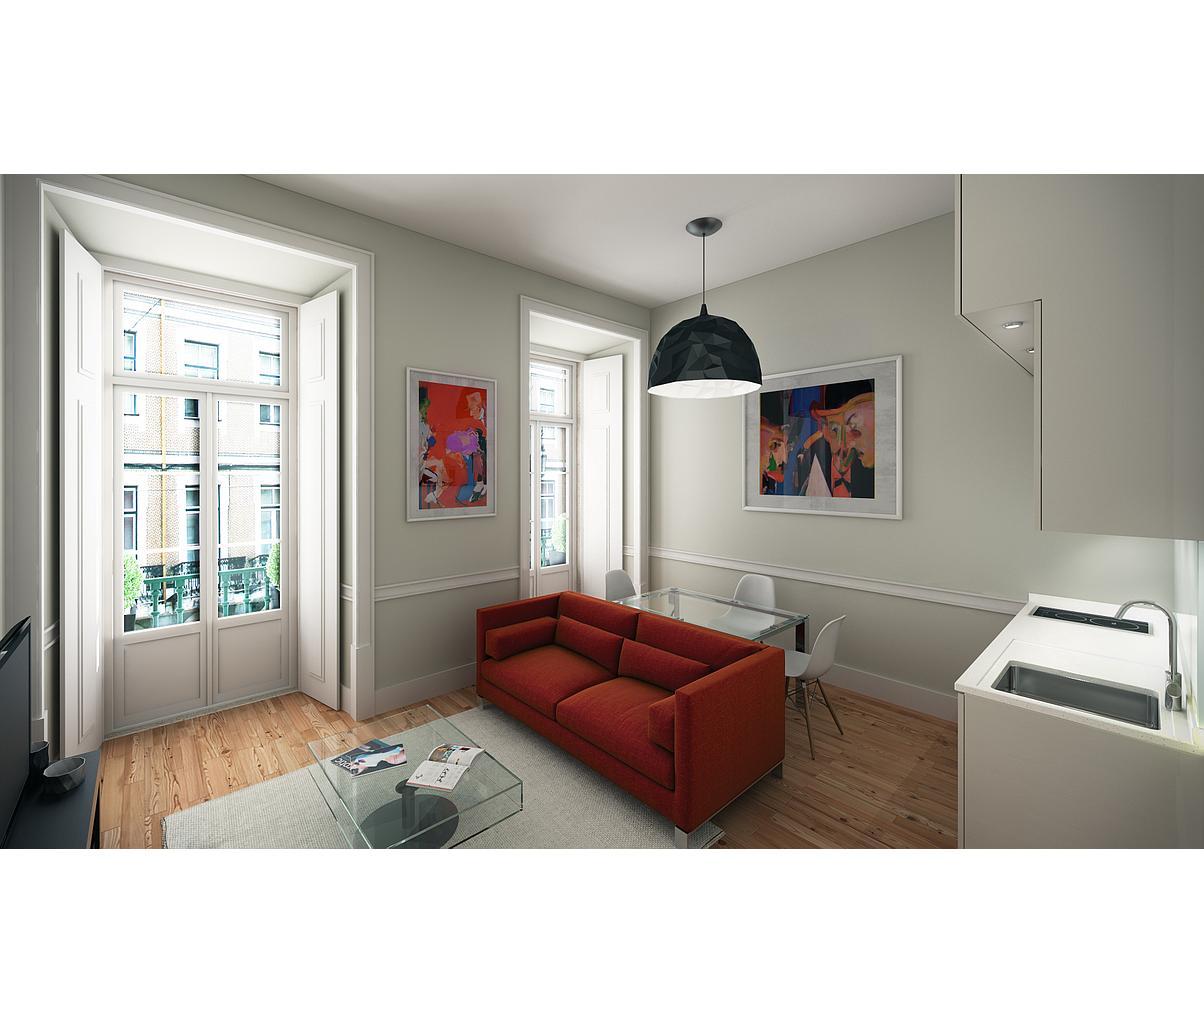 PF09445, Apartamento T1, Lisboa